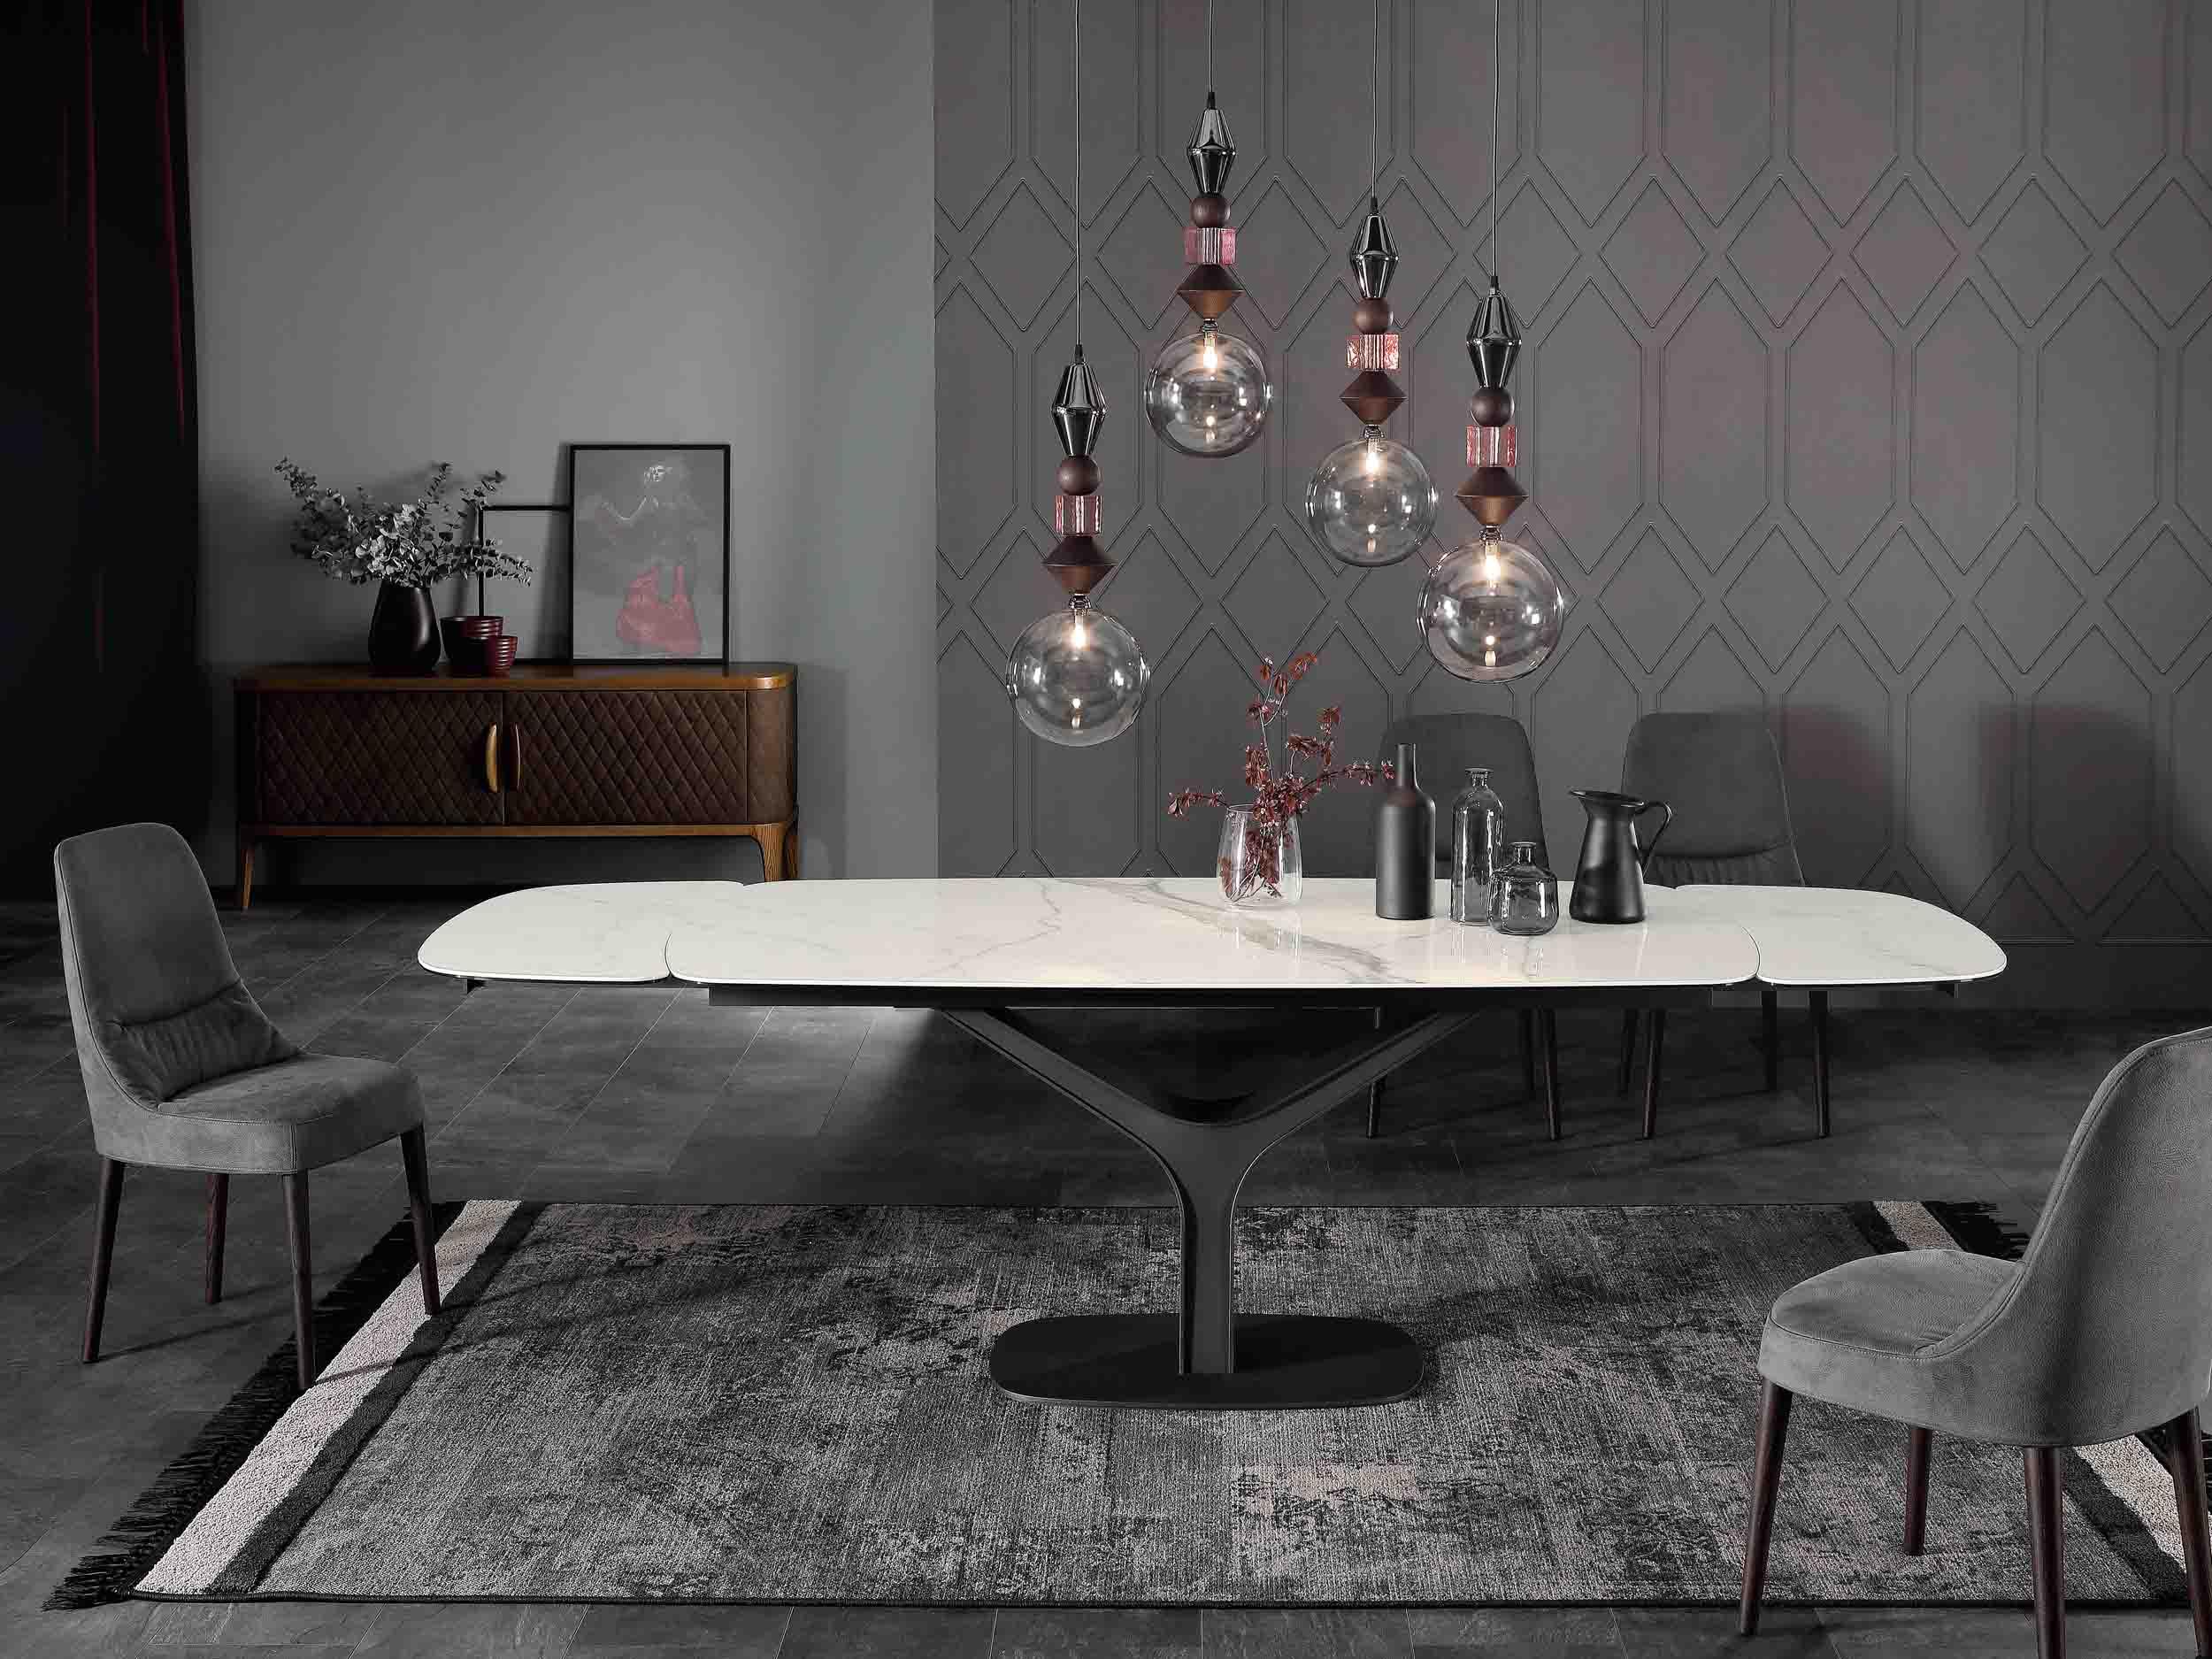 Ariston Table + Juliette Chair